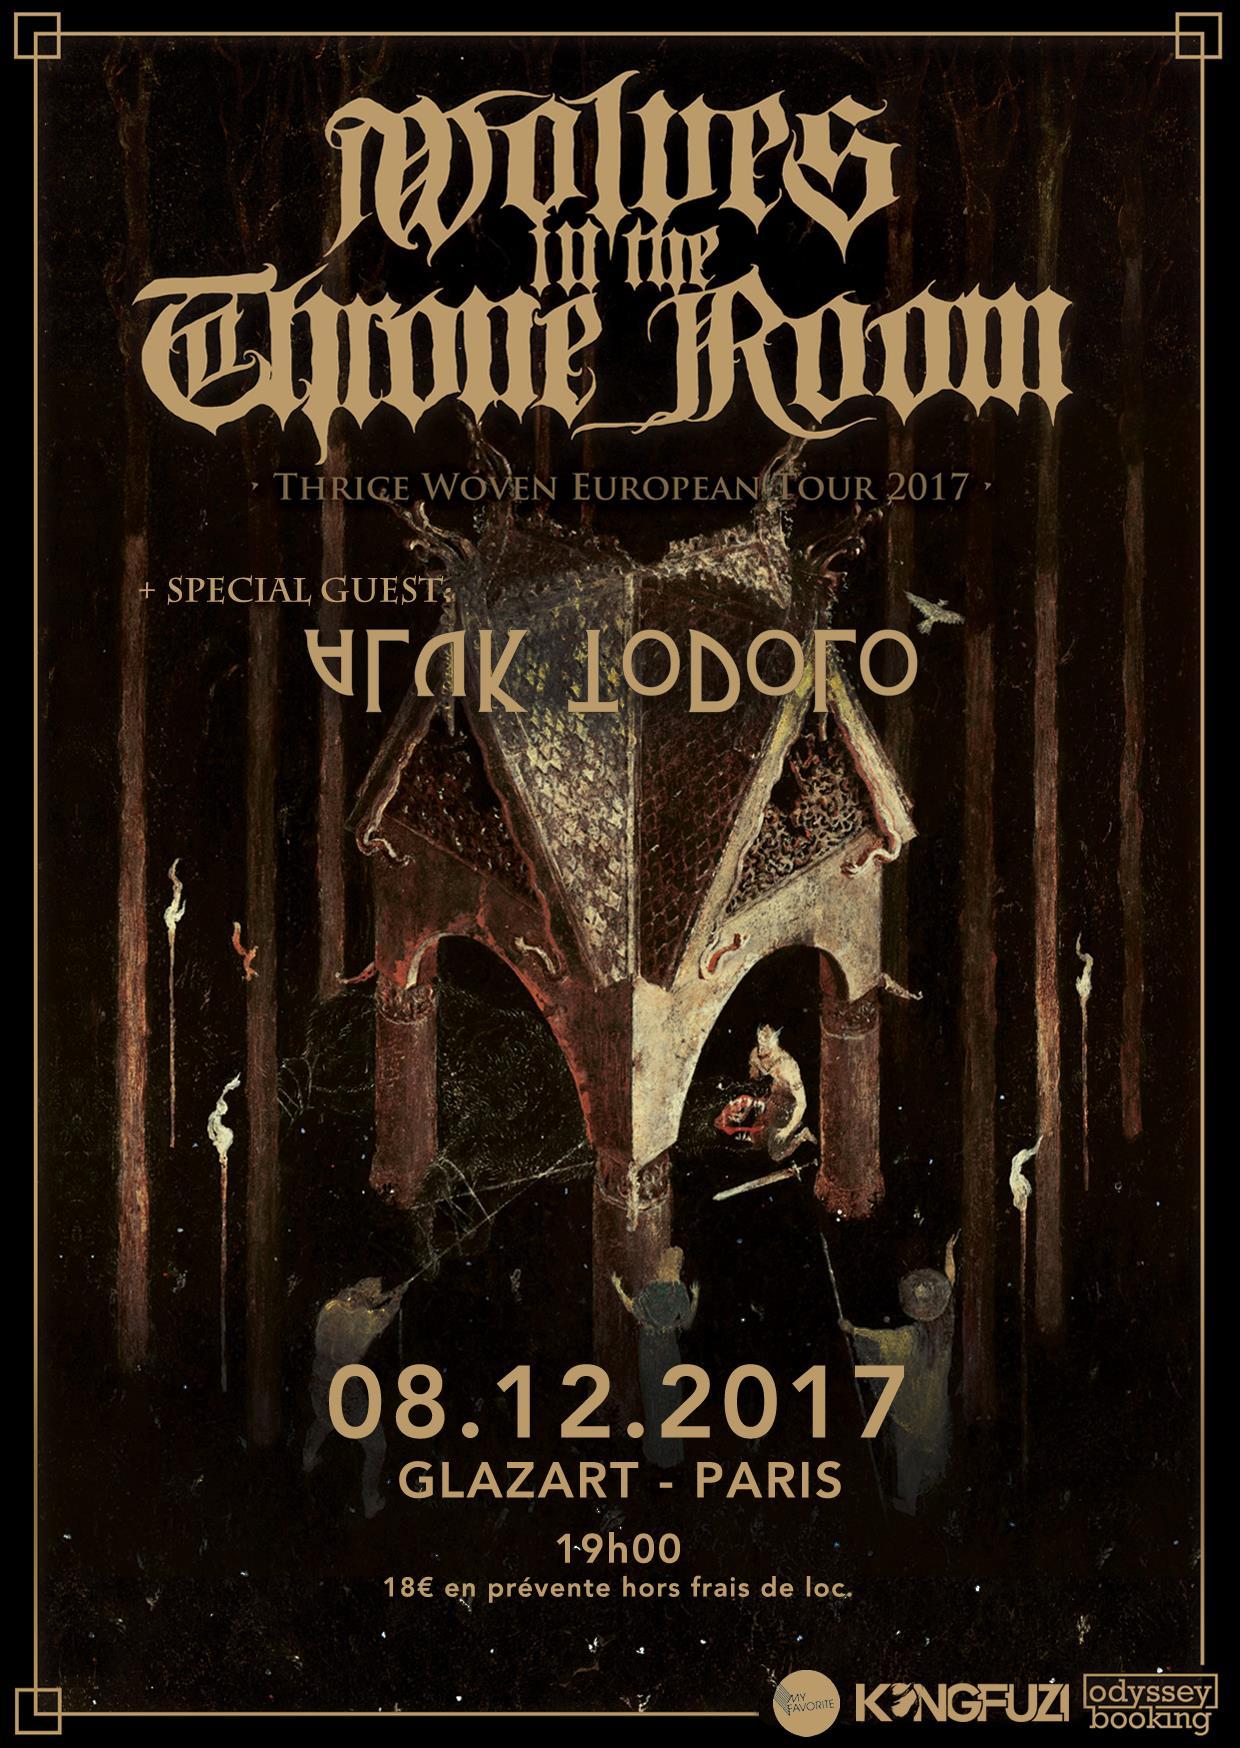 Wolves In The Throne Room + Aluk Todolo @ Glazart (Paris), le 8 Décembre 2017